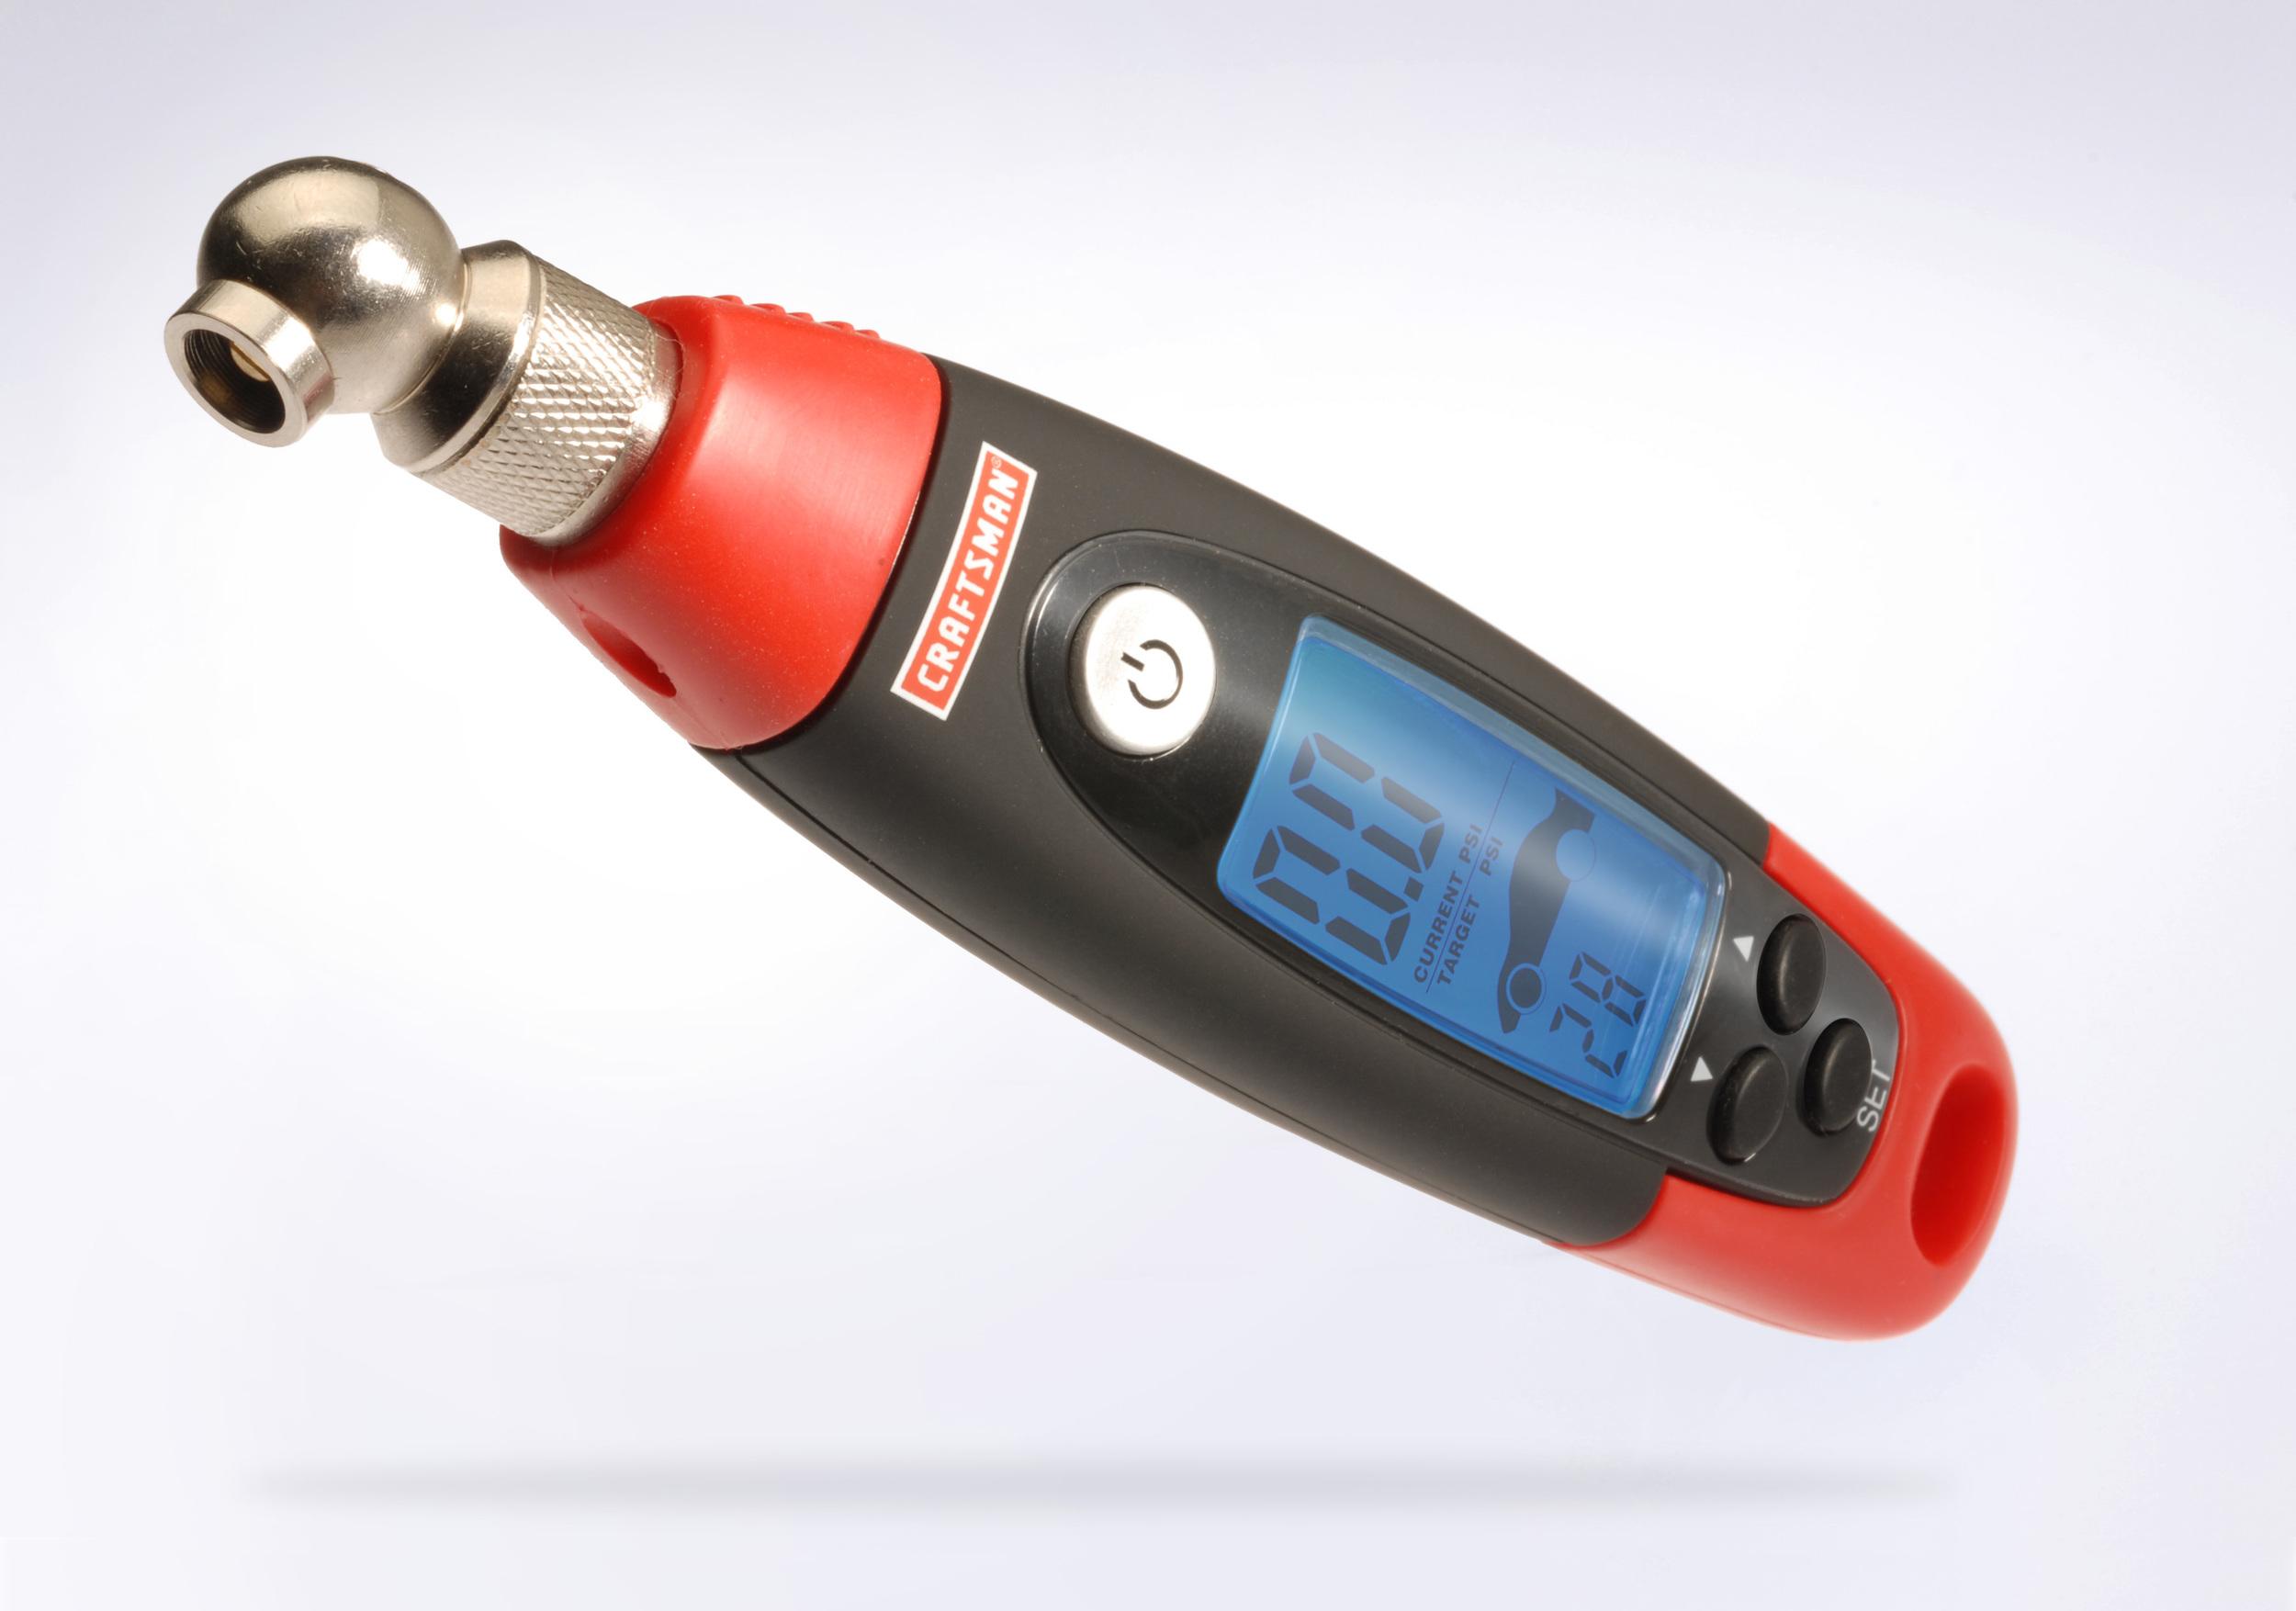 Craftsman digital tire gauge